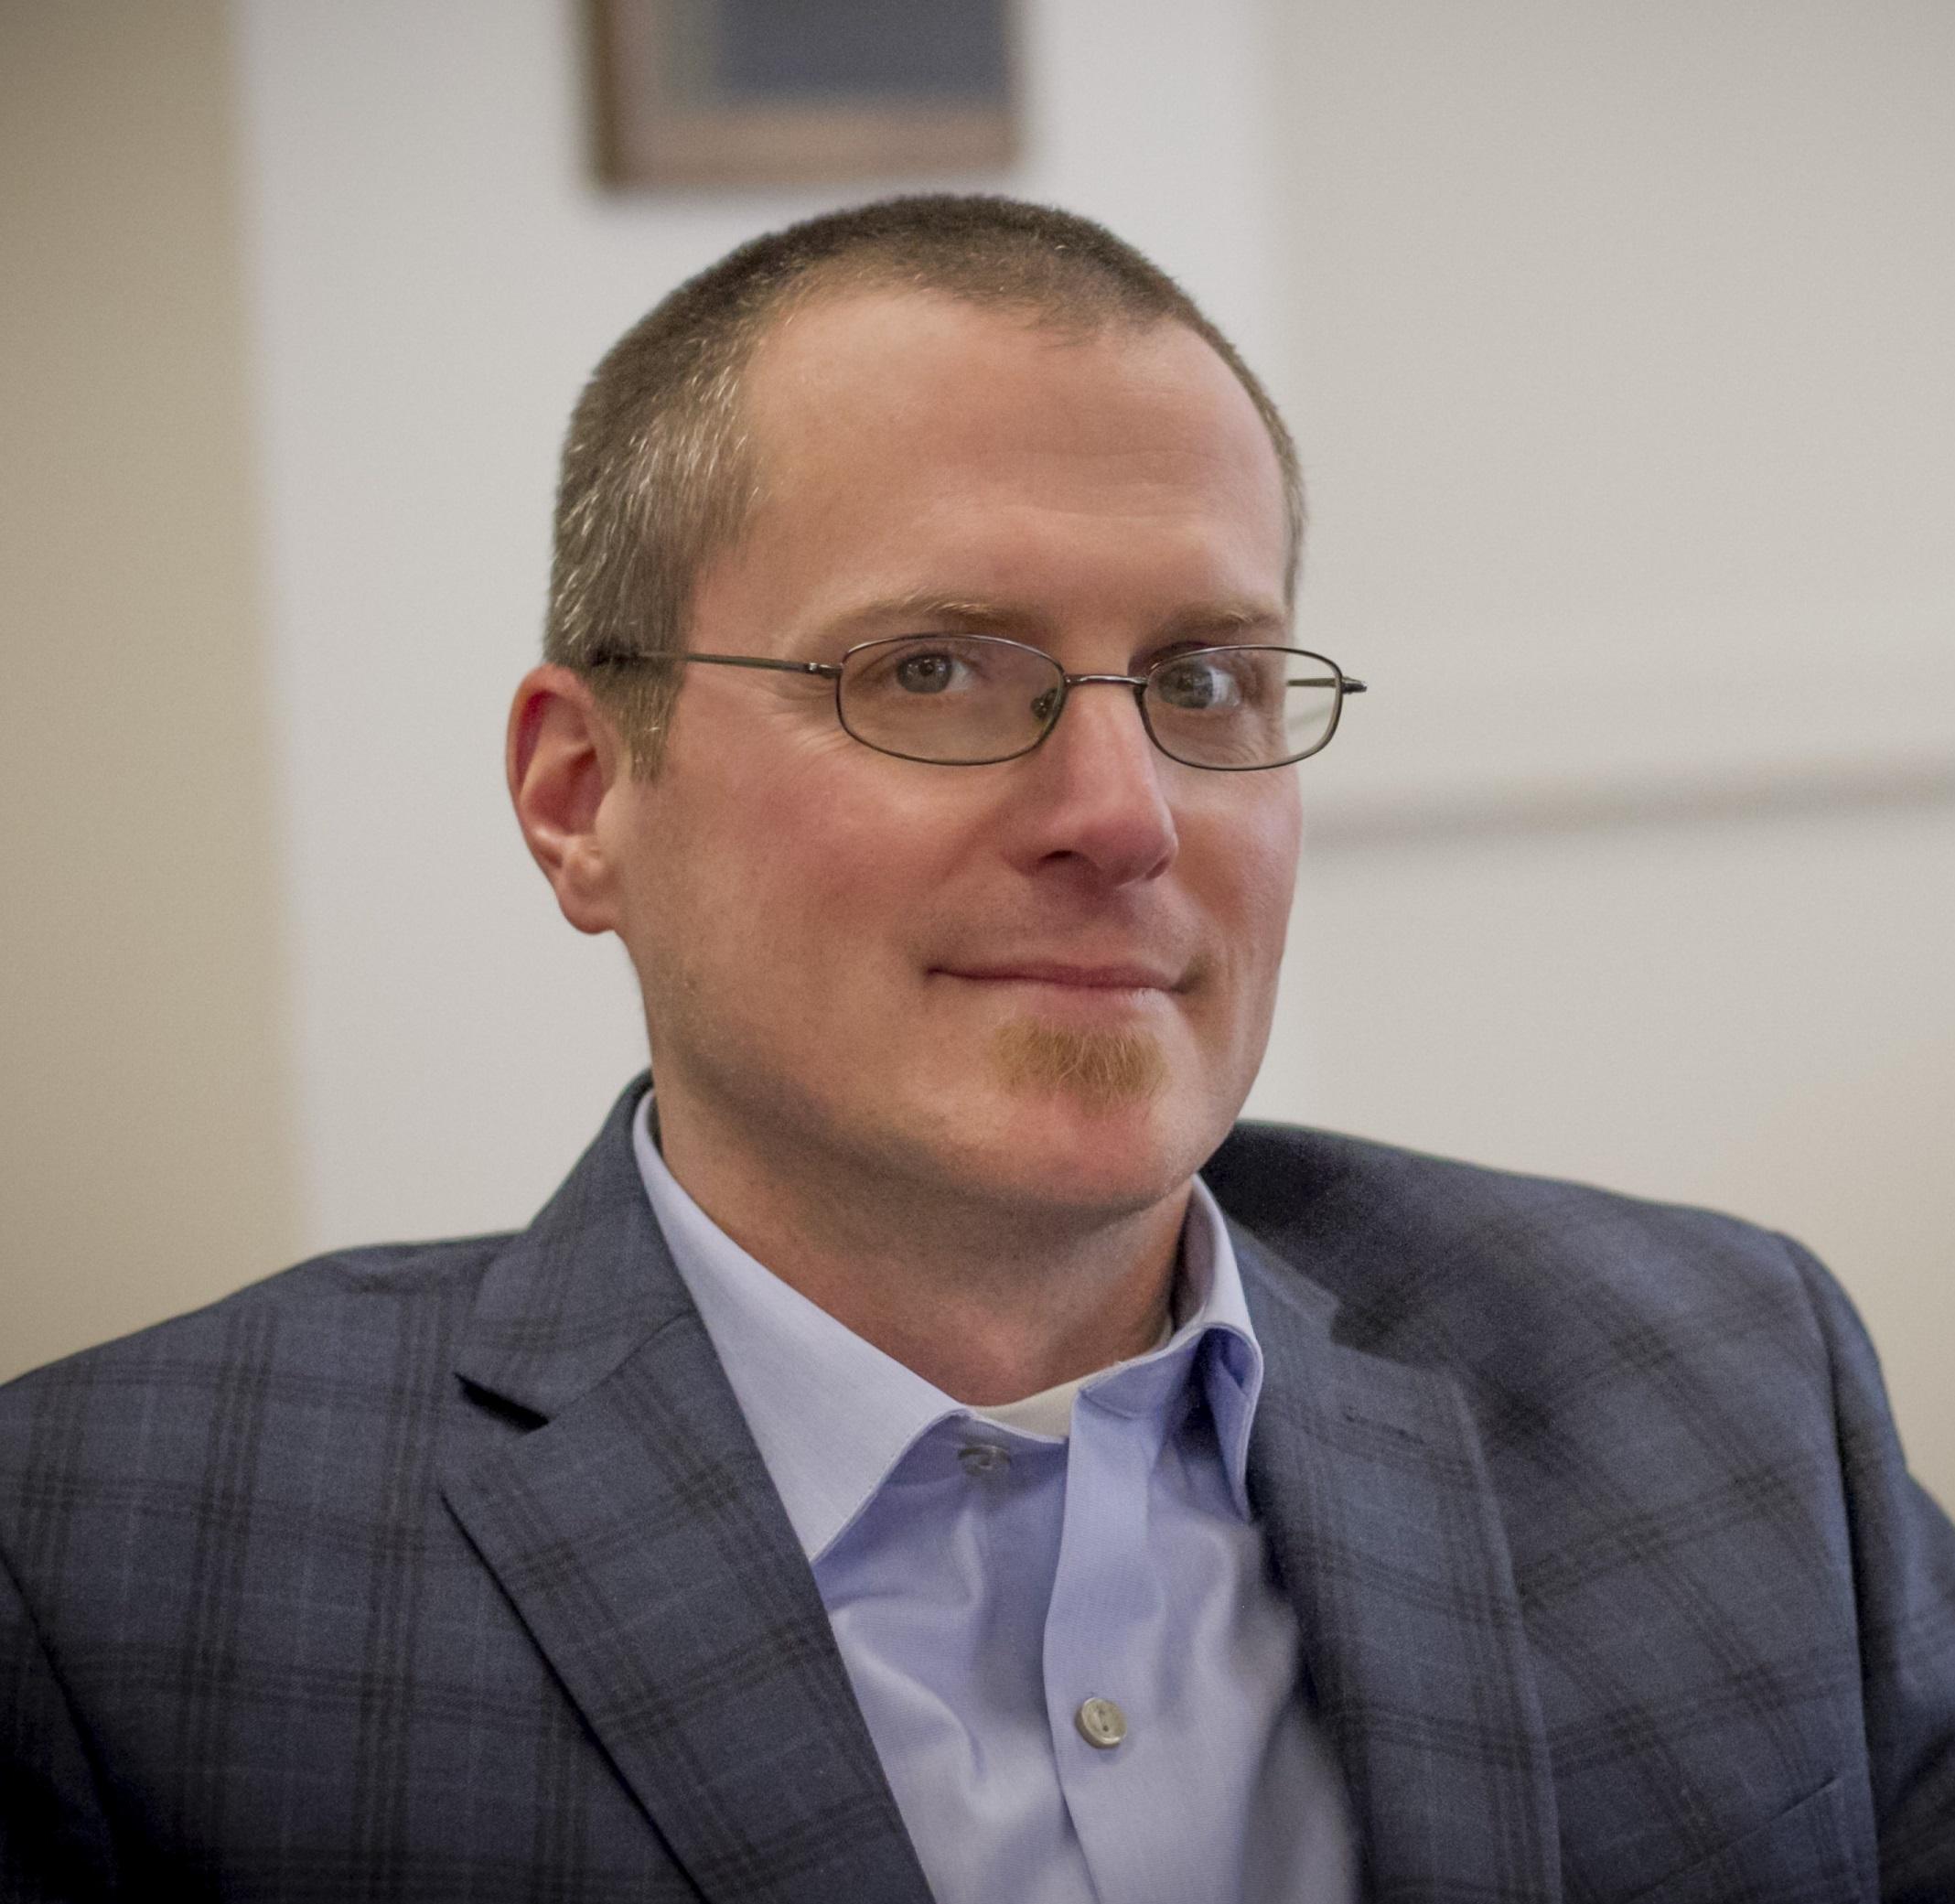 Dr. Davis Rosch